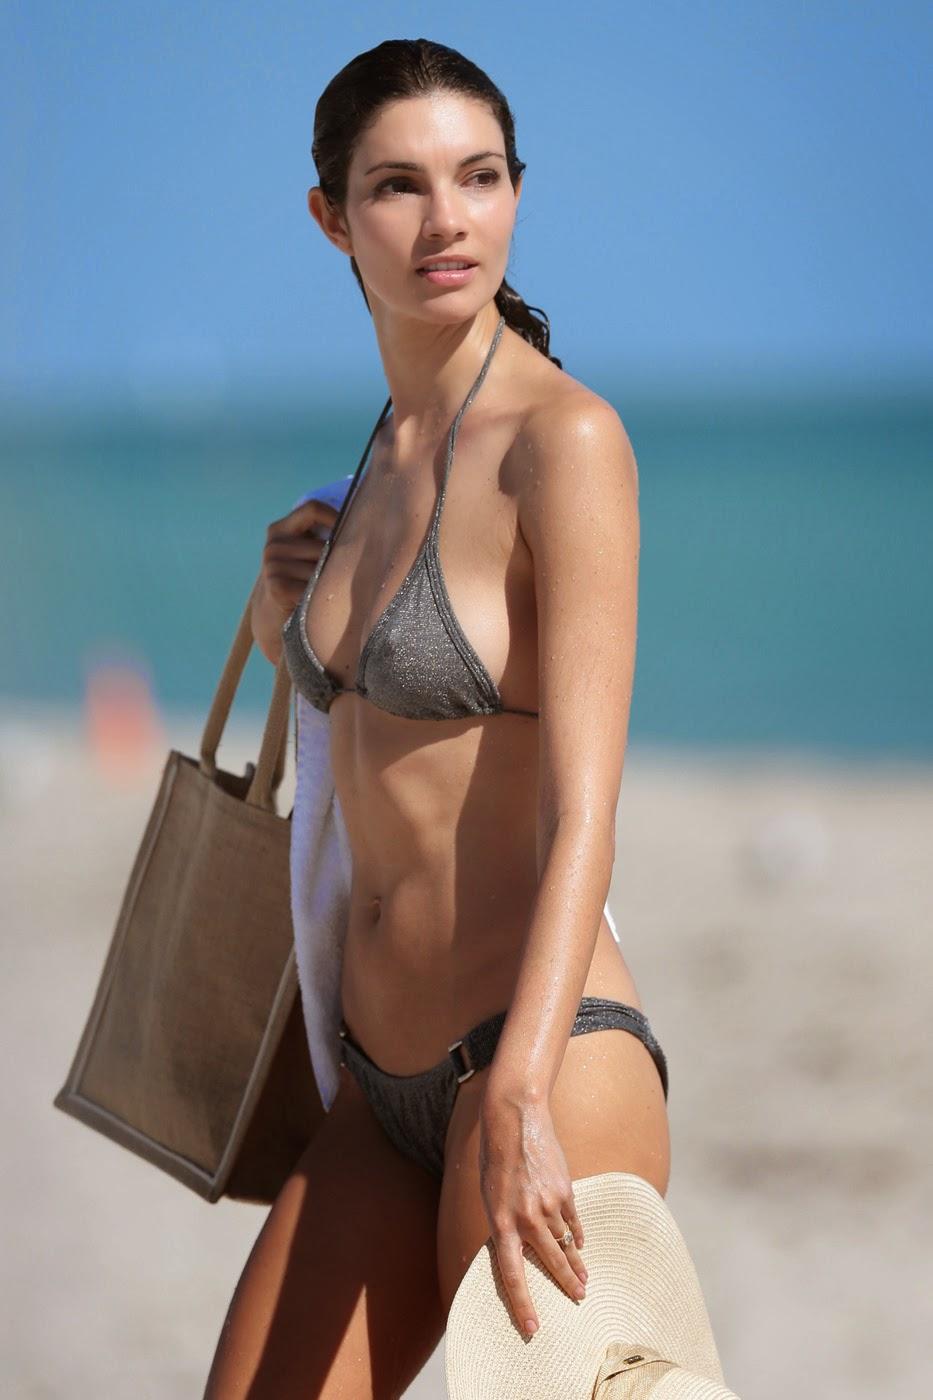 nude model Teresa moore